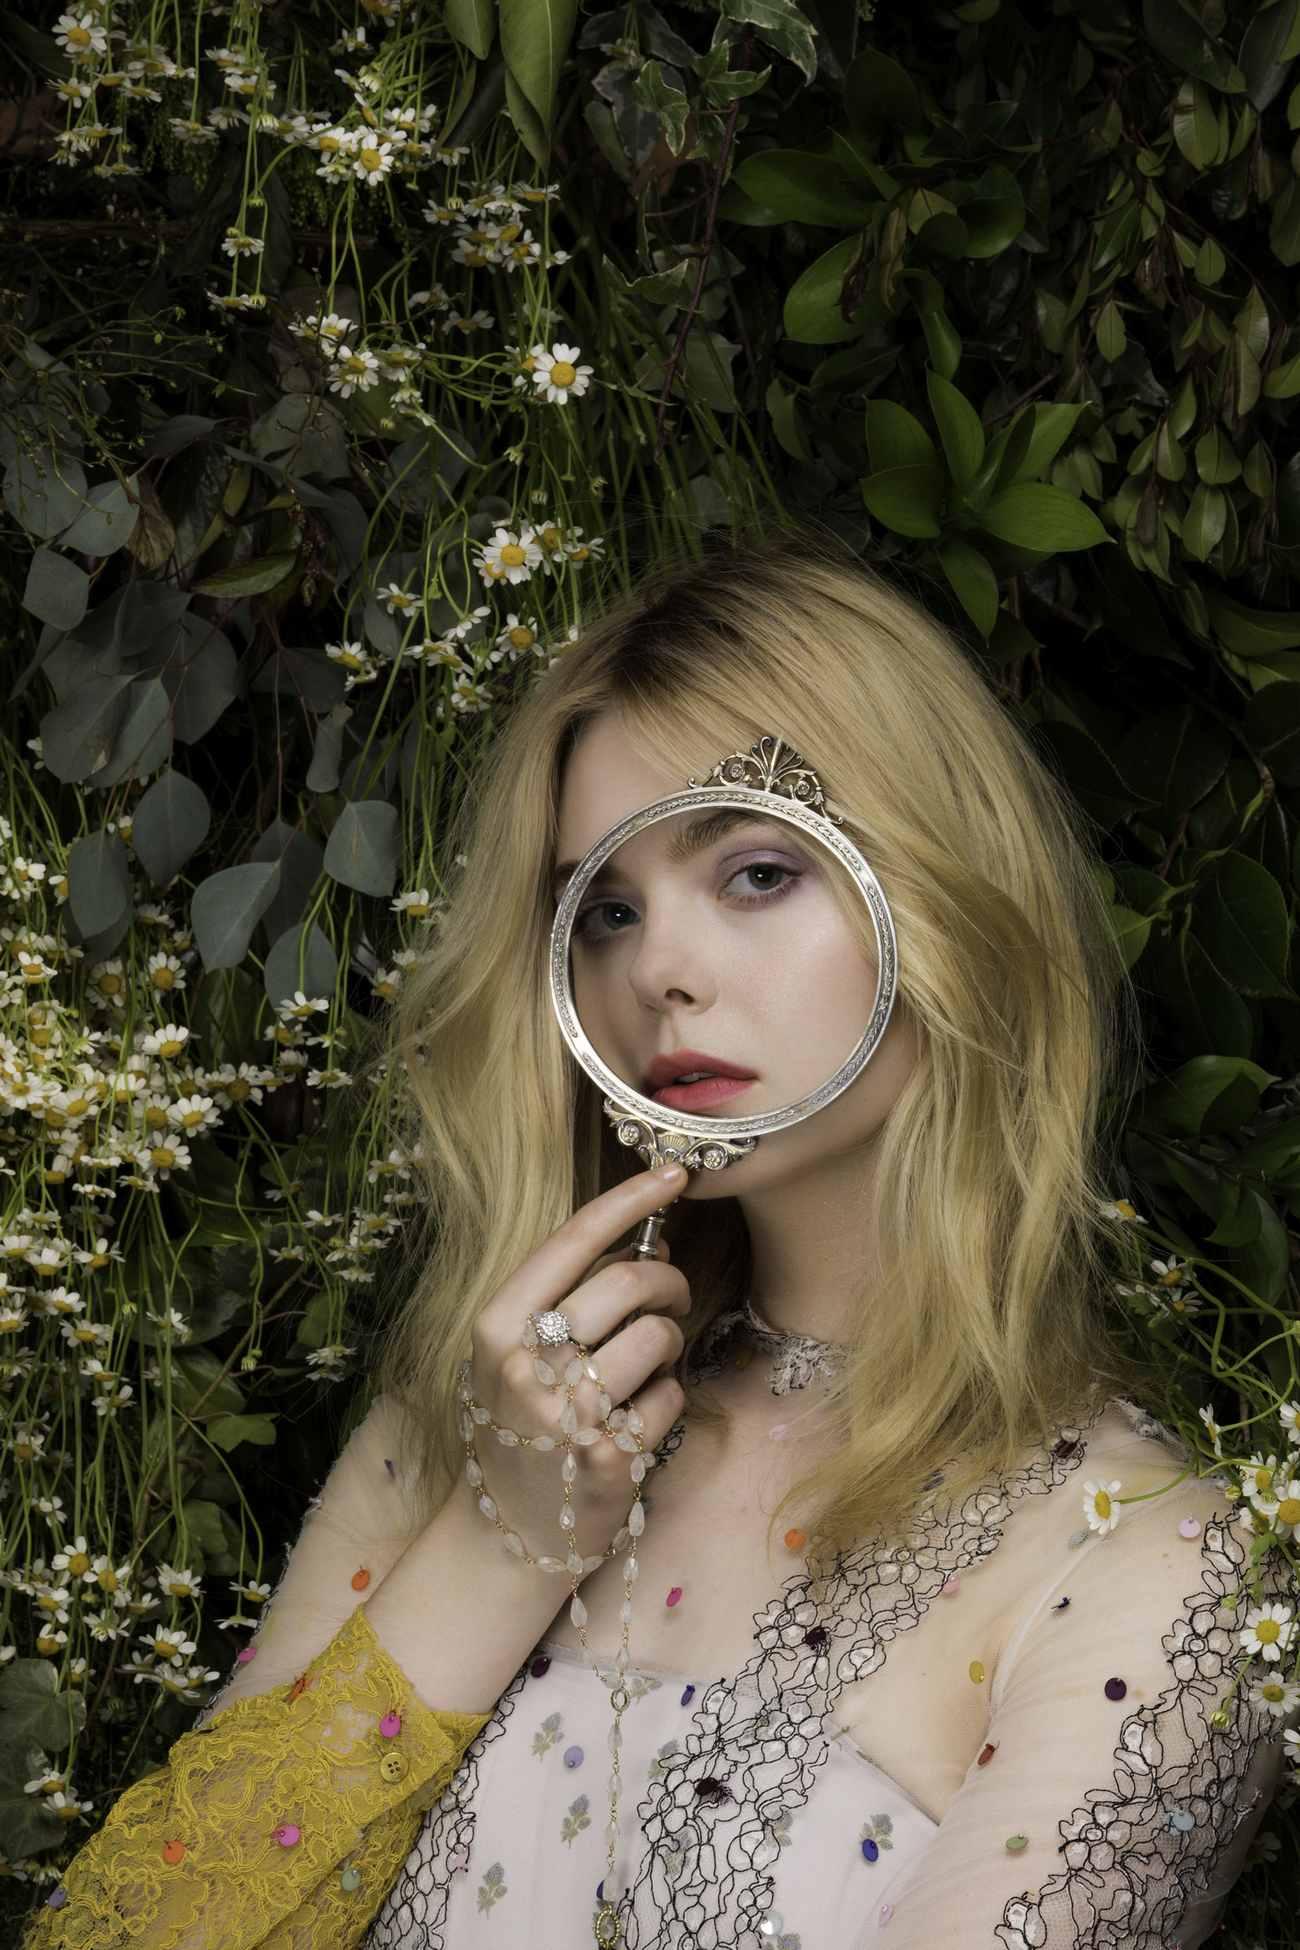 Elle-Fanning-Vanity-Fair-Italia-June-201800008.jpg